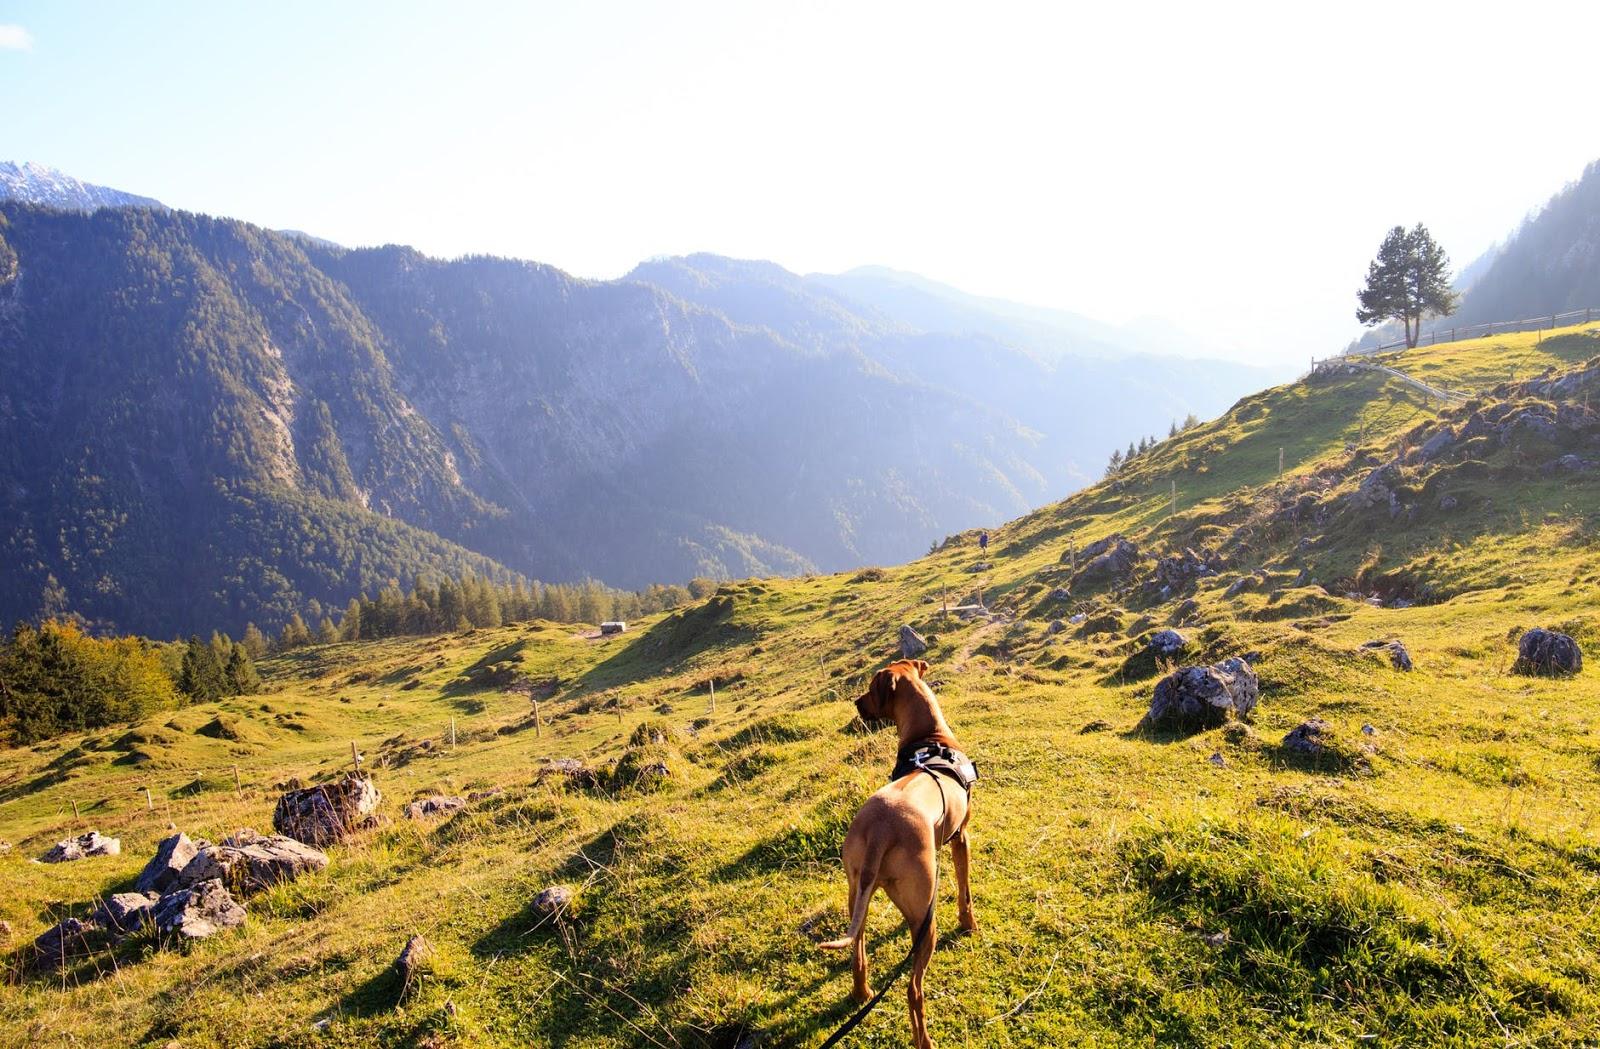 dog in open mountain range